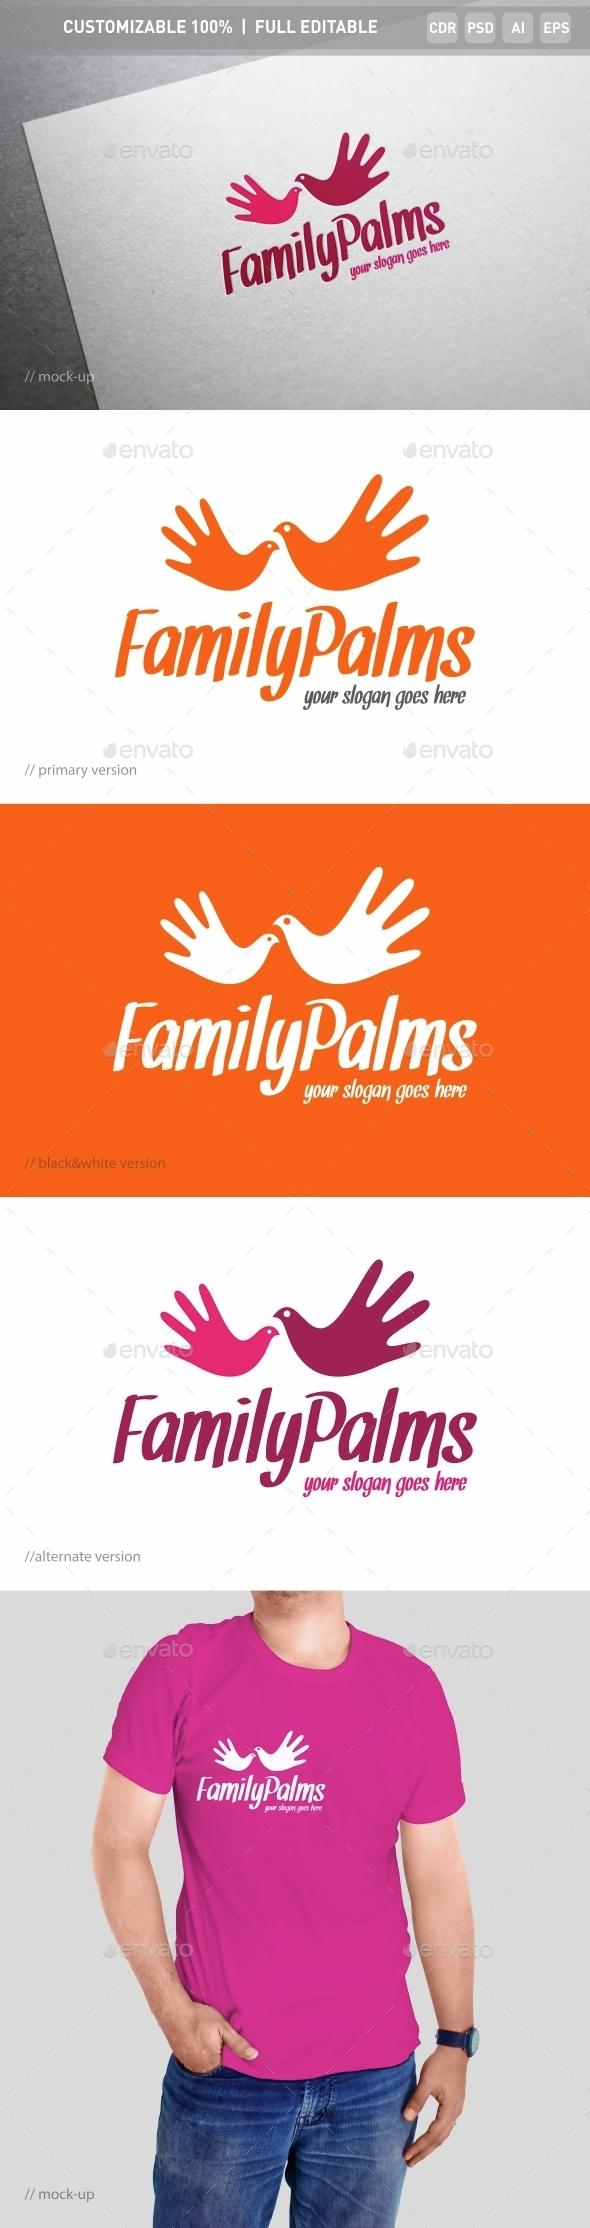 Family Palms Logo Template